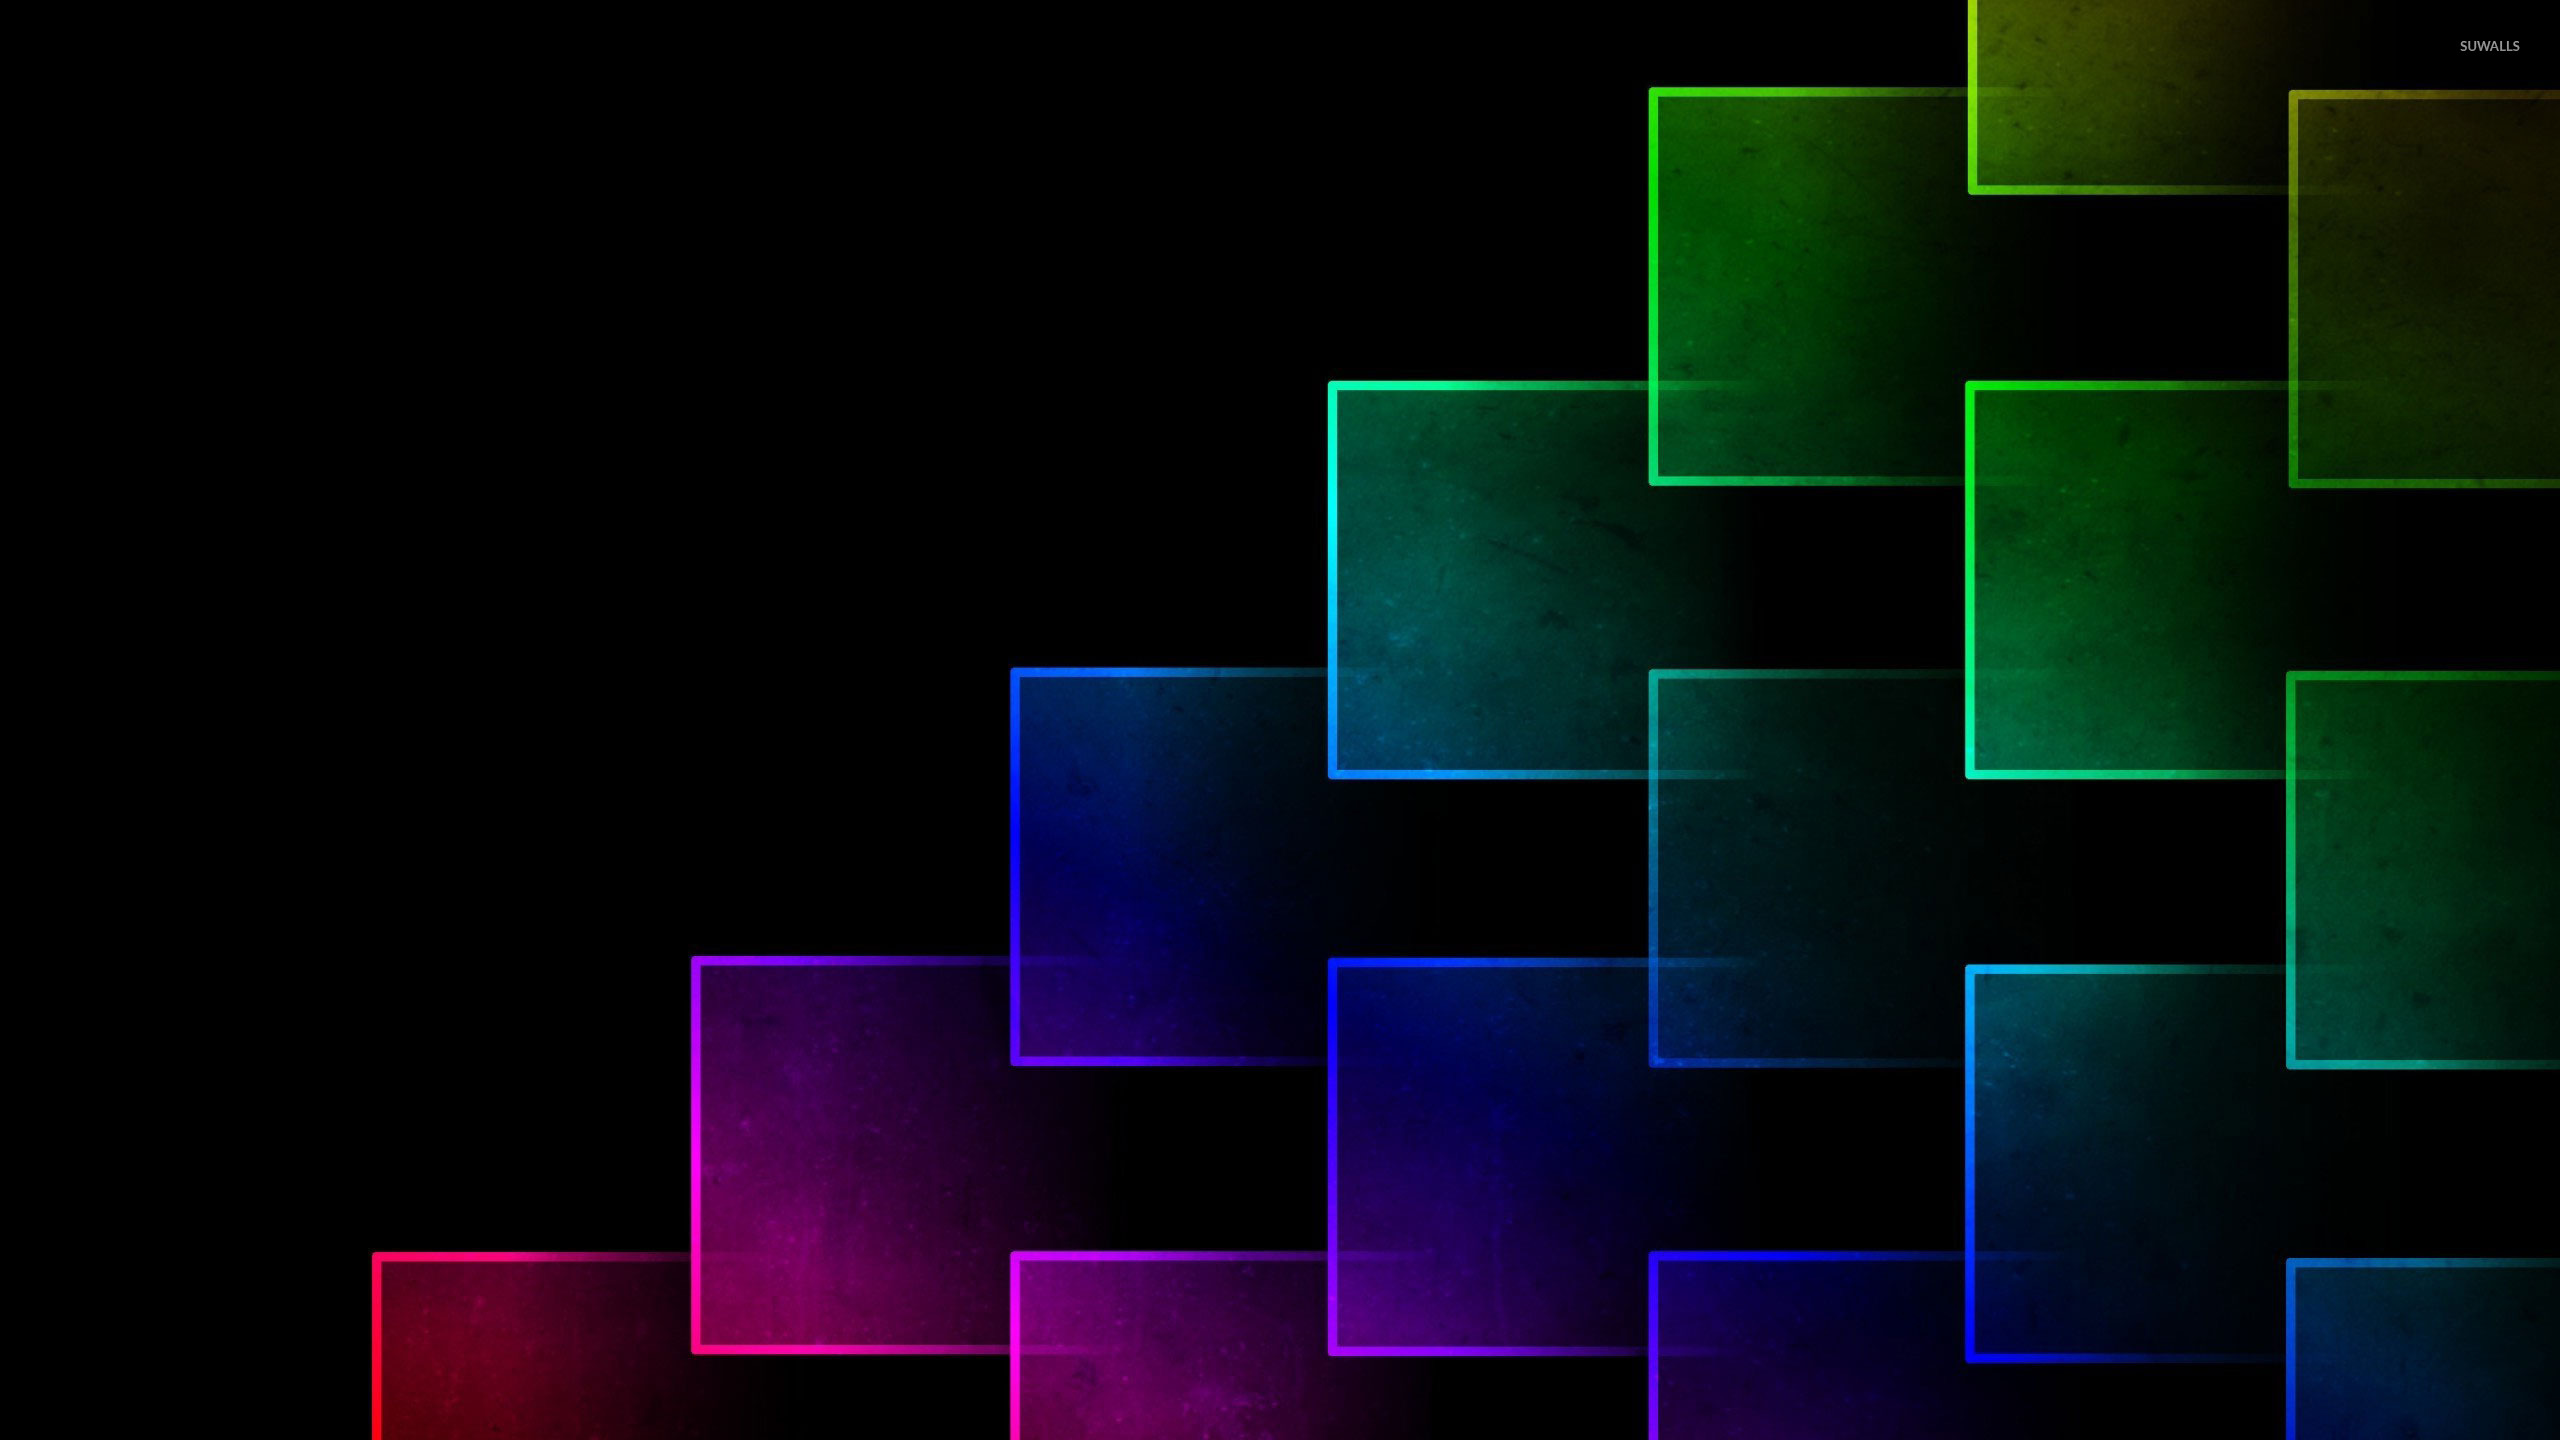 Glowing neon squares wallpaper - 215.1KB